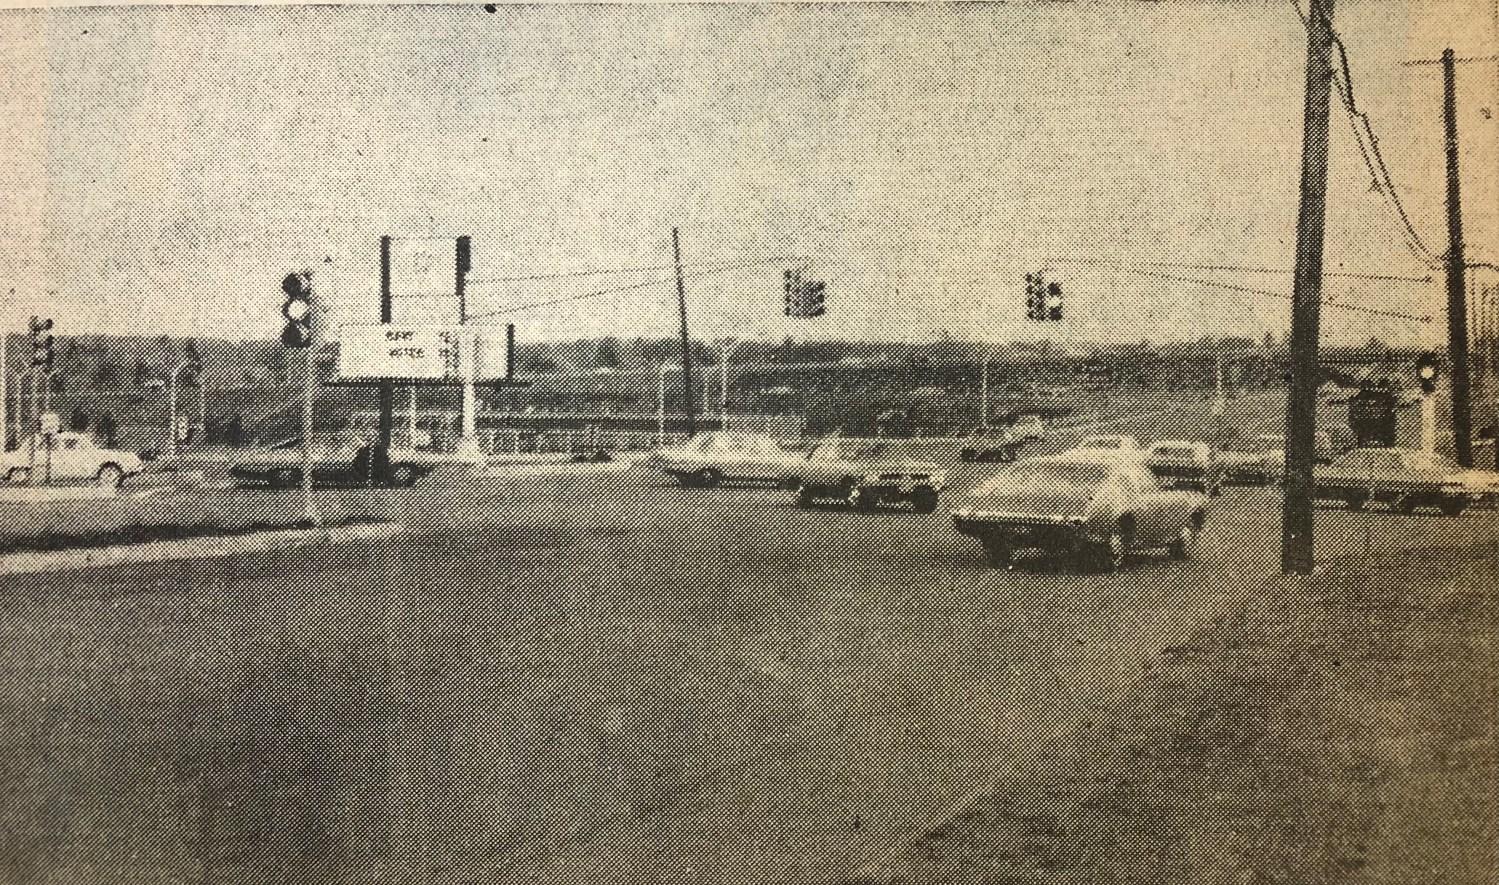 Traffic light chaos fall of 1968 Burlington MA